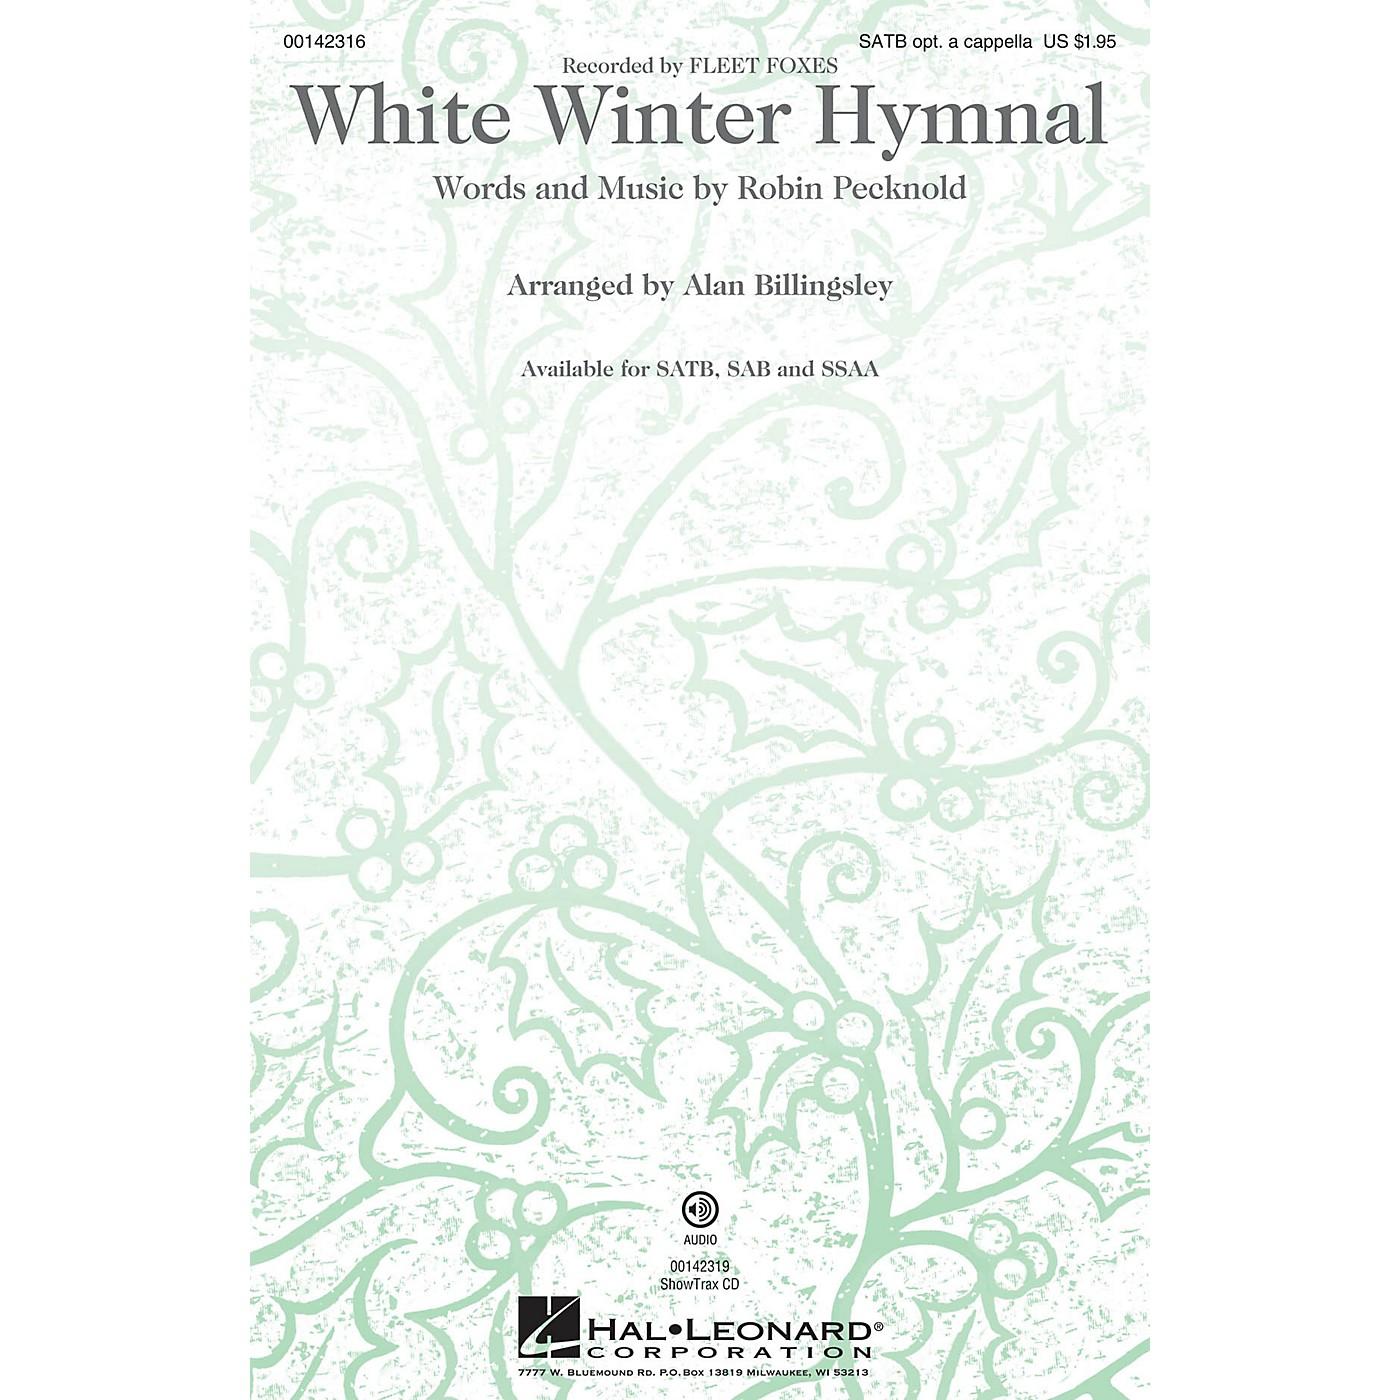 Hal Leonard White Winter Hymnal SATB by Fleet Foxes arranged by Alan Billingsley thumbnail